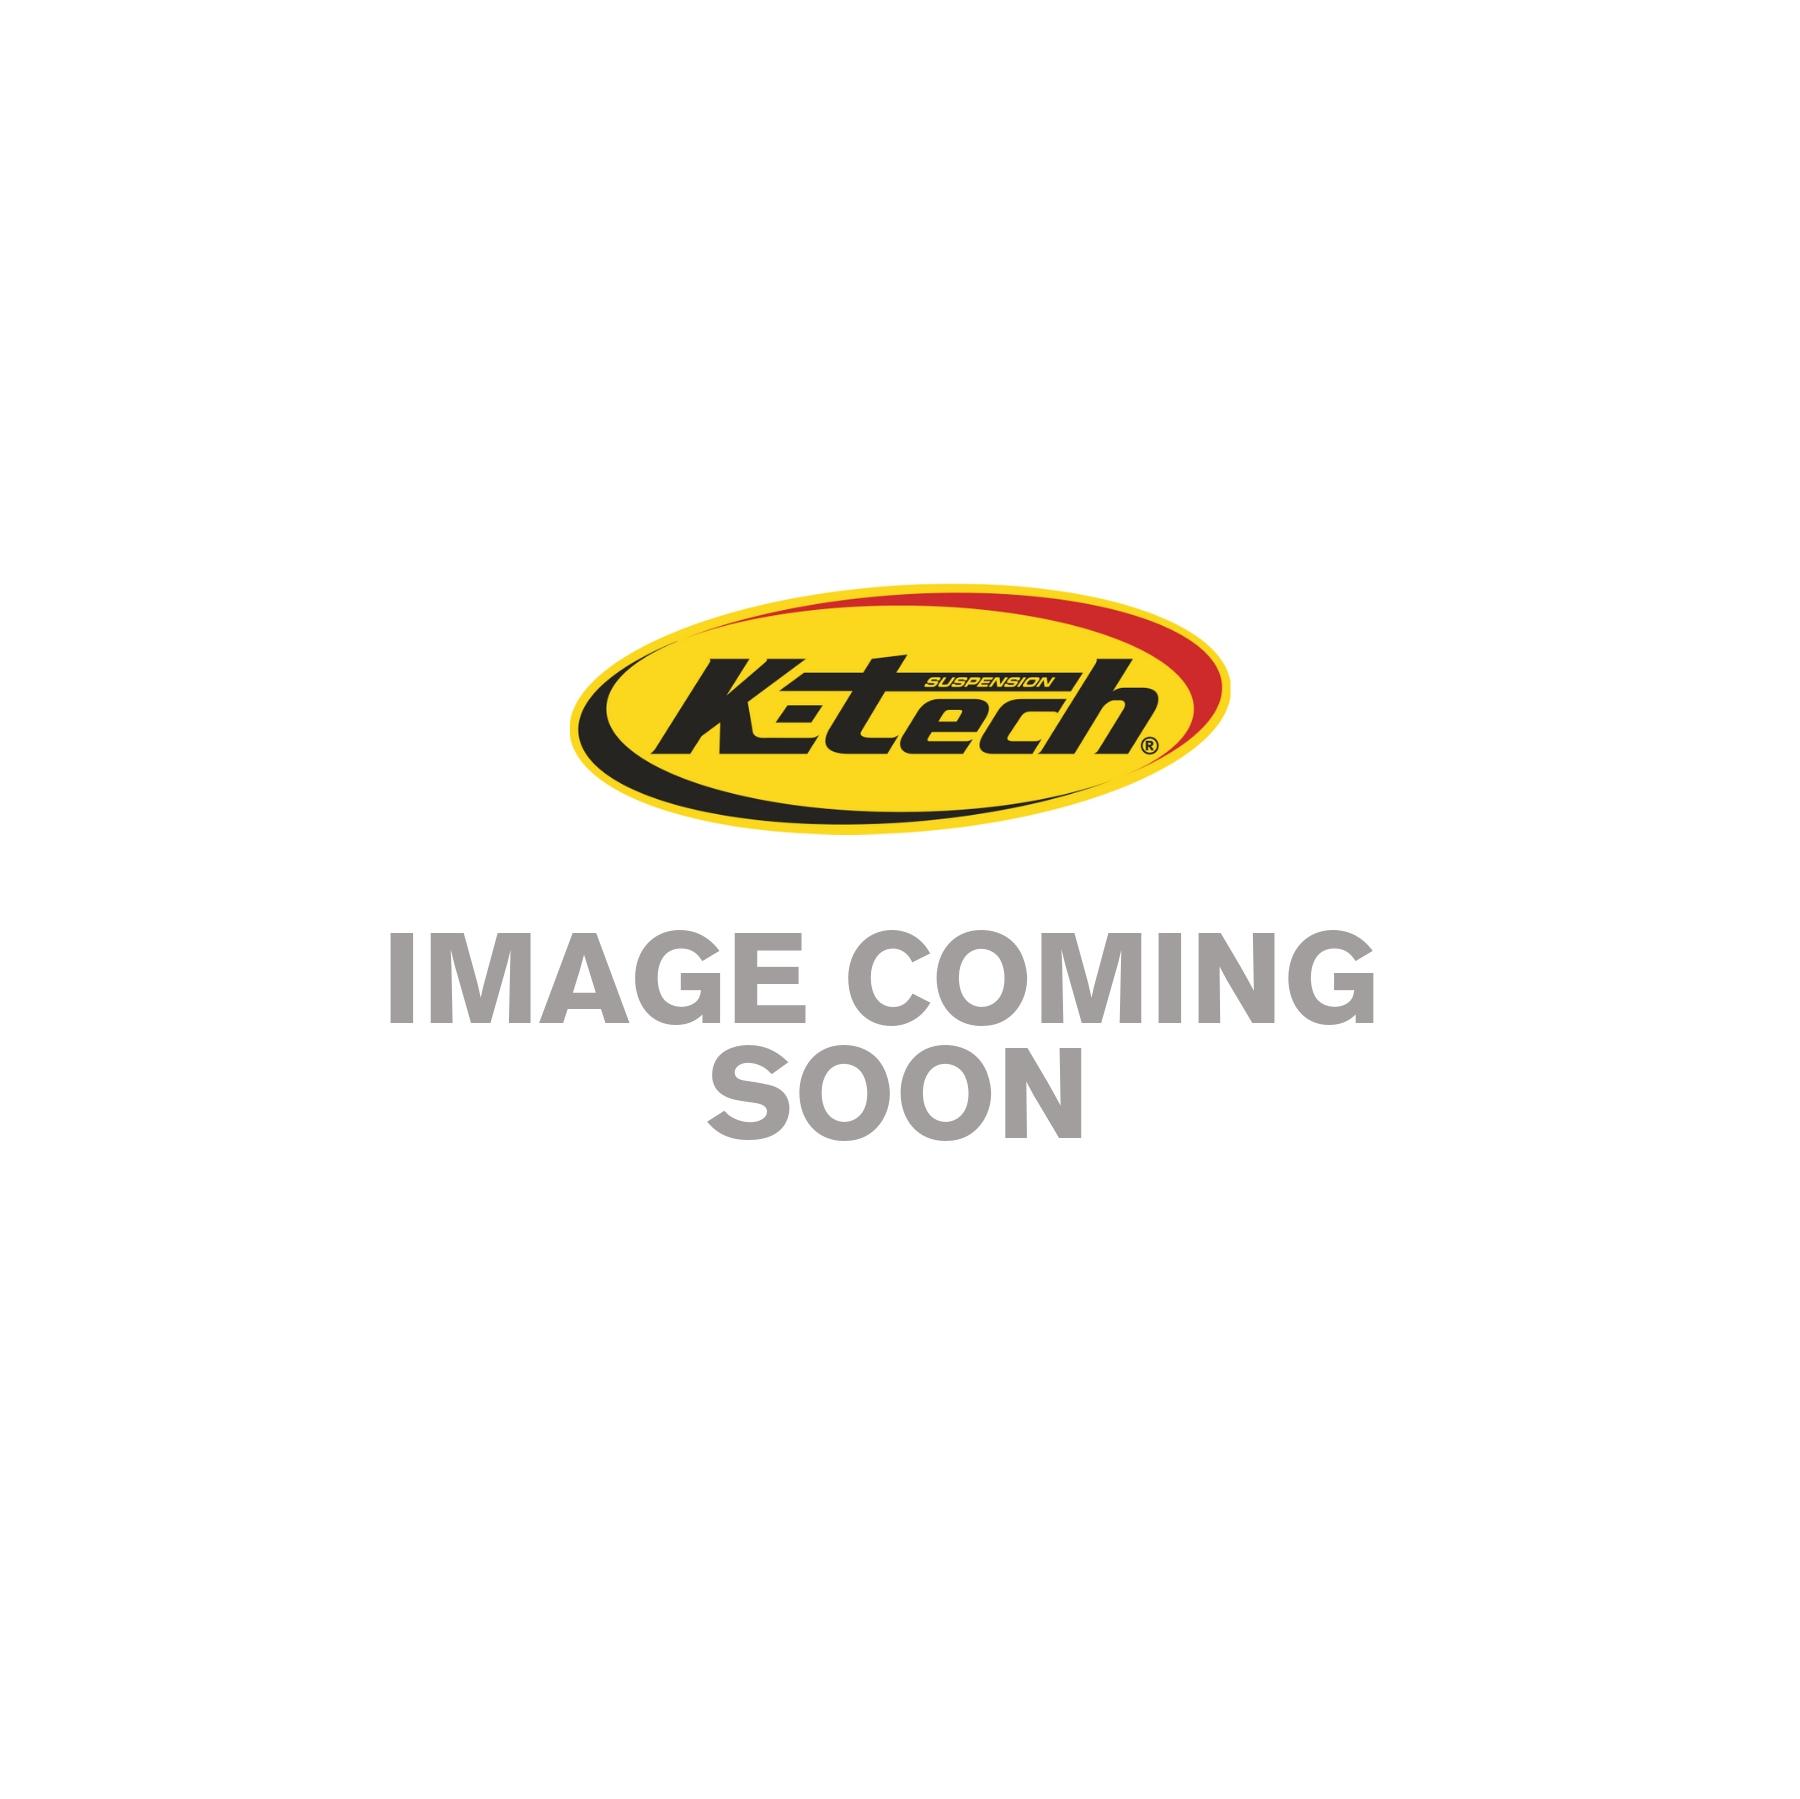 Tracker Front Fork Cartridges Moto Guzzi V7 2008-2016 Kaifa